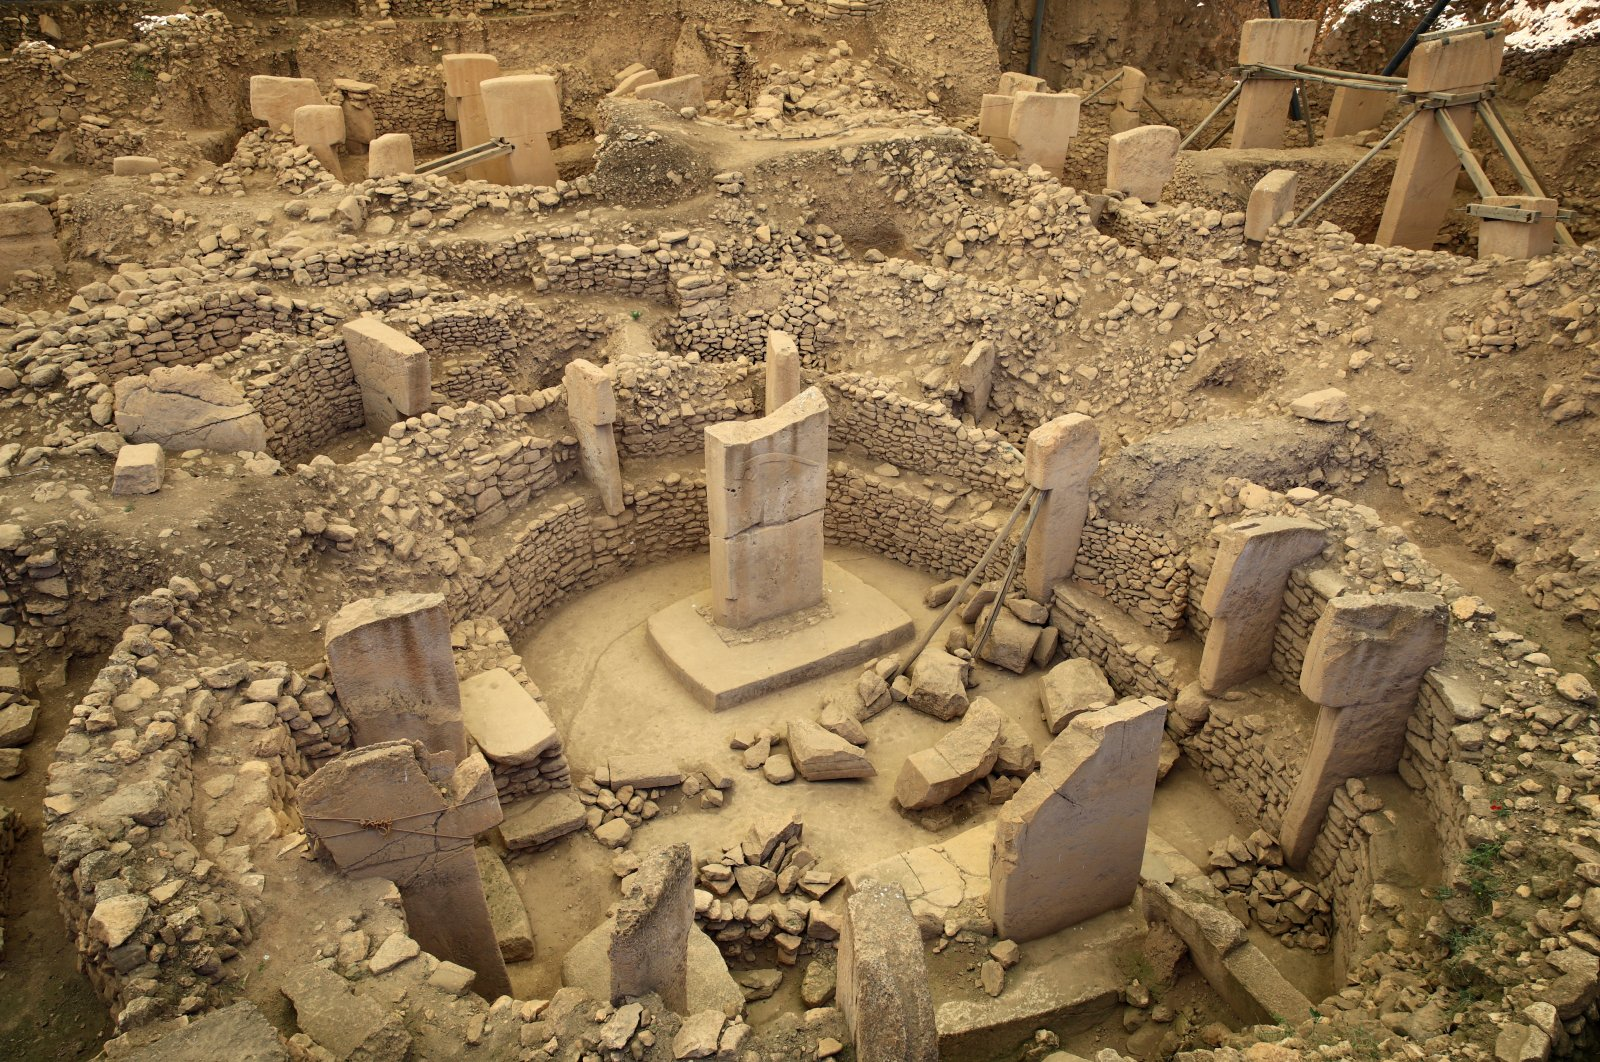 A general view of an excavation site is seen in Göbeklitepe in the southeastern province of Şanlıurfa, Turkey, June 2, 2019. (Reuters Photo)